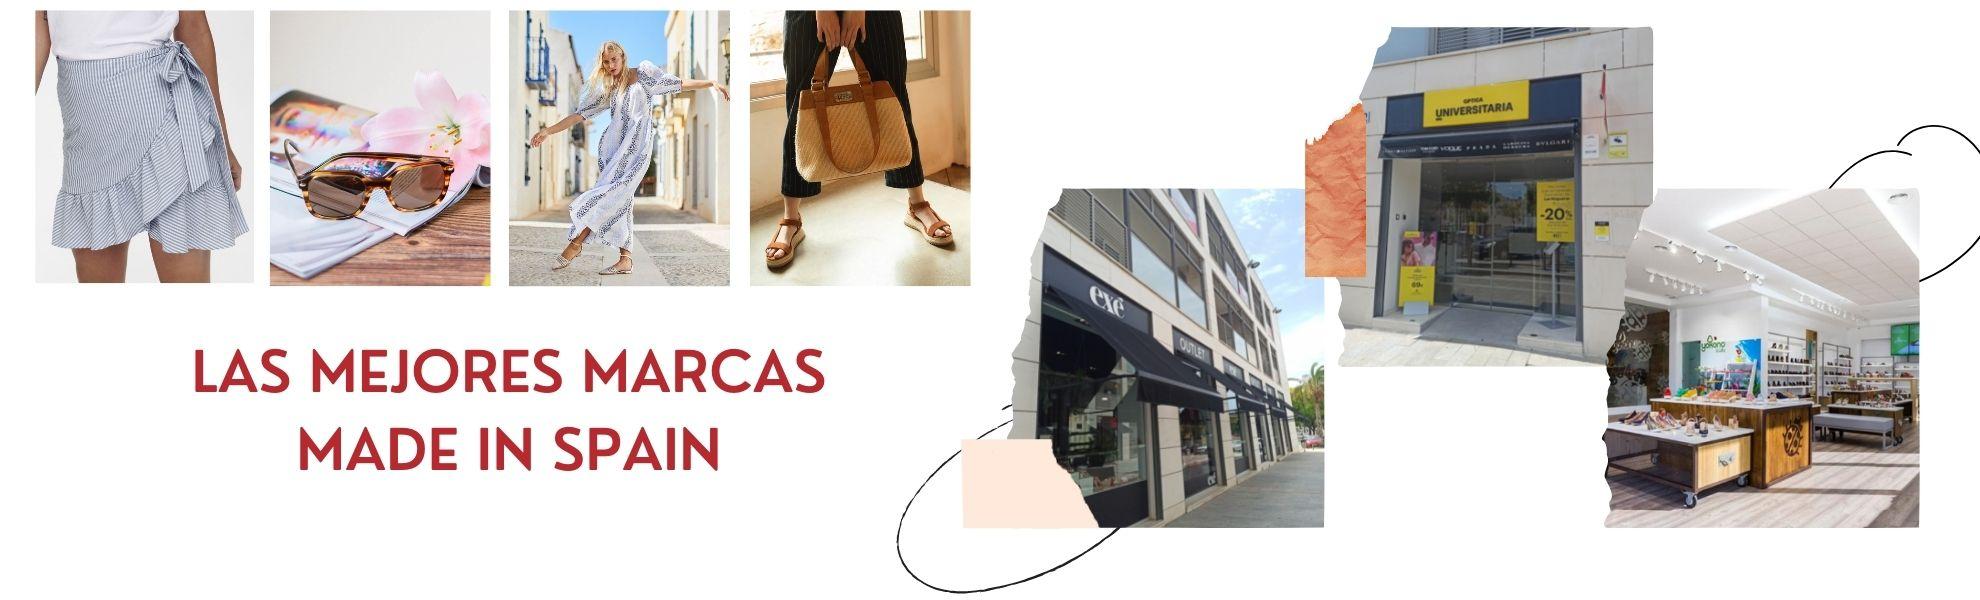 Las mejores marcas made in Spain